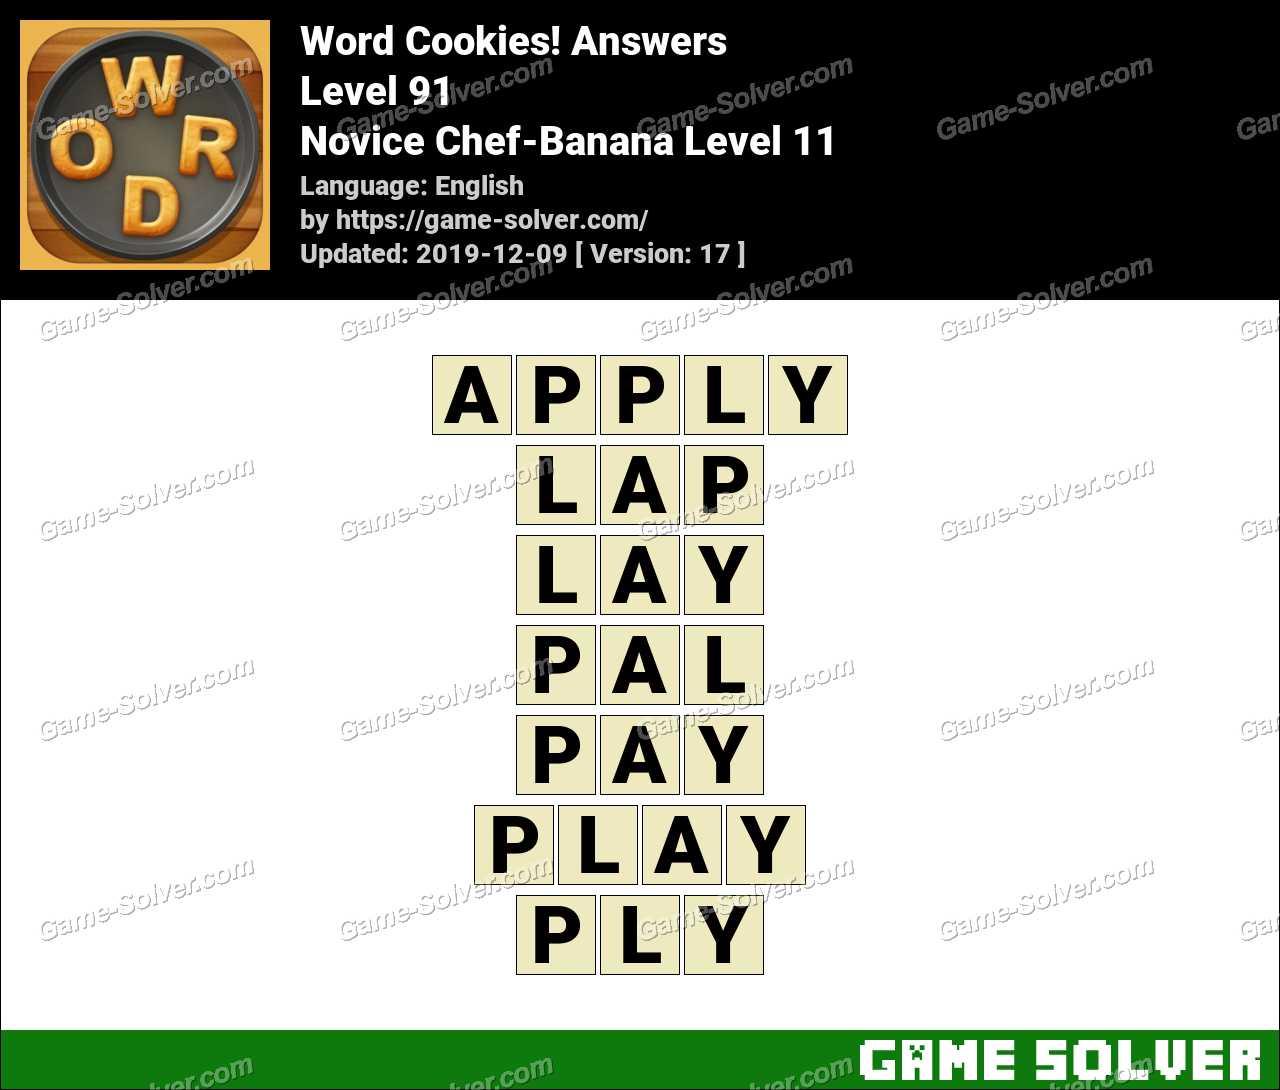 Word Cookies Novice Chef-Banana Level 11 Answers